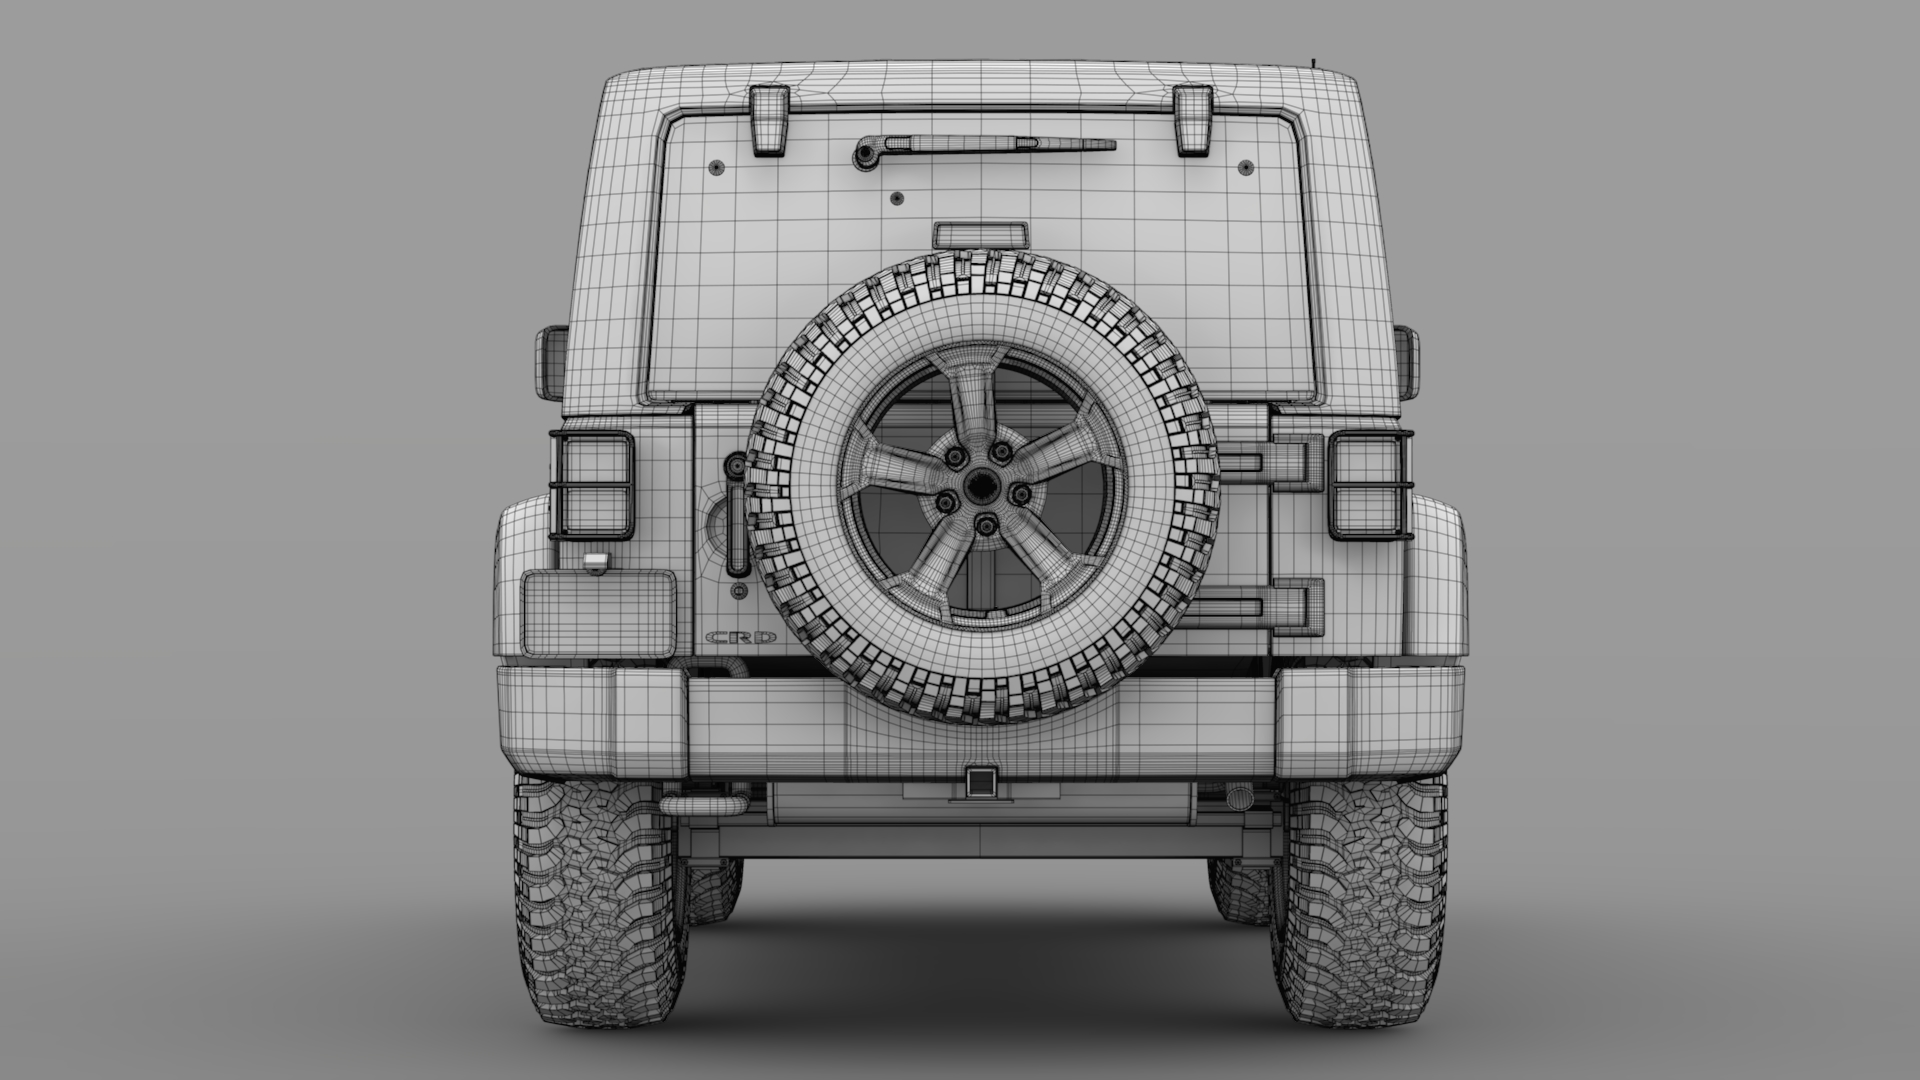 jeep wrangler chief jk 2017 3d model max fbx c4d lwo ma mb hrc xsi obj 276886